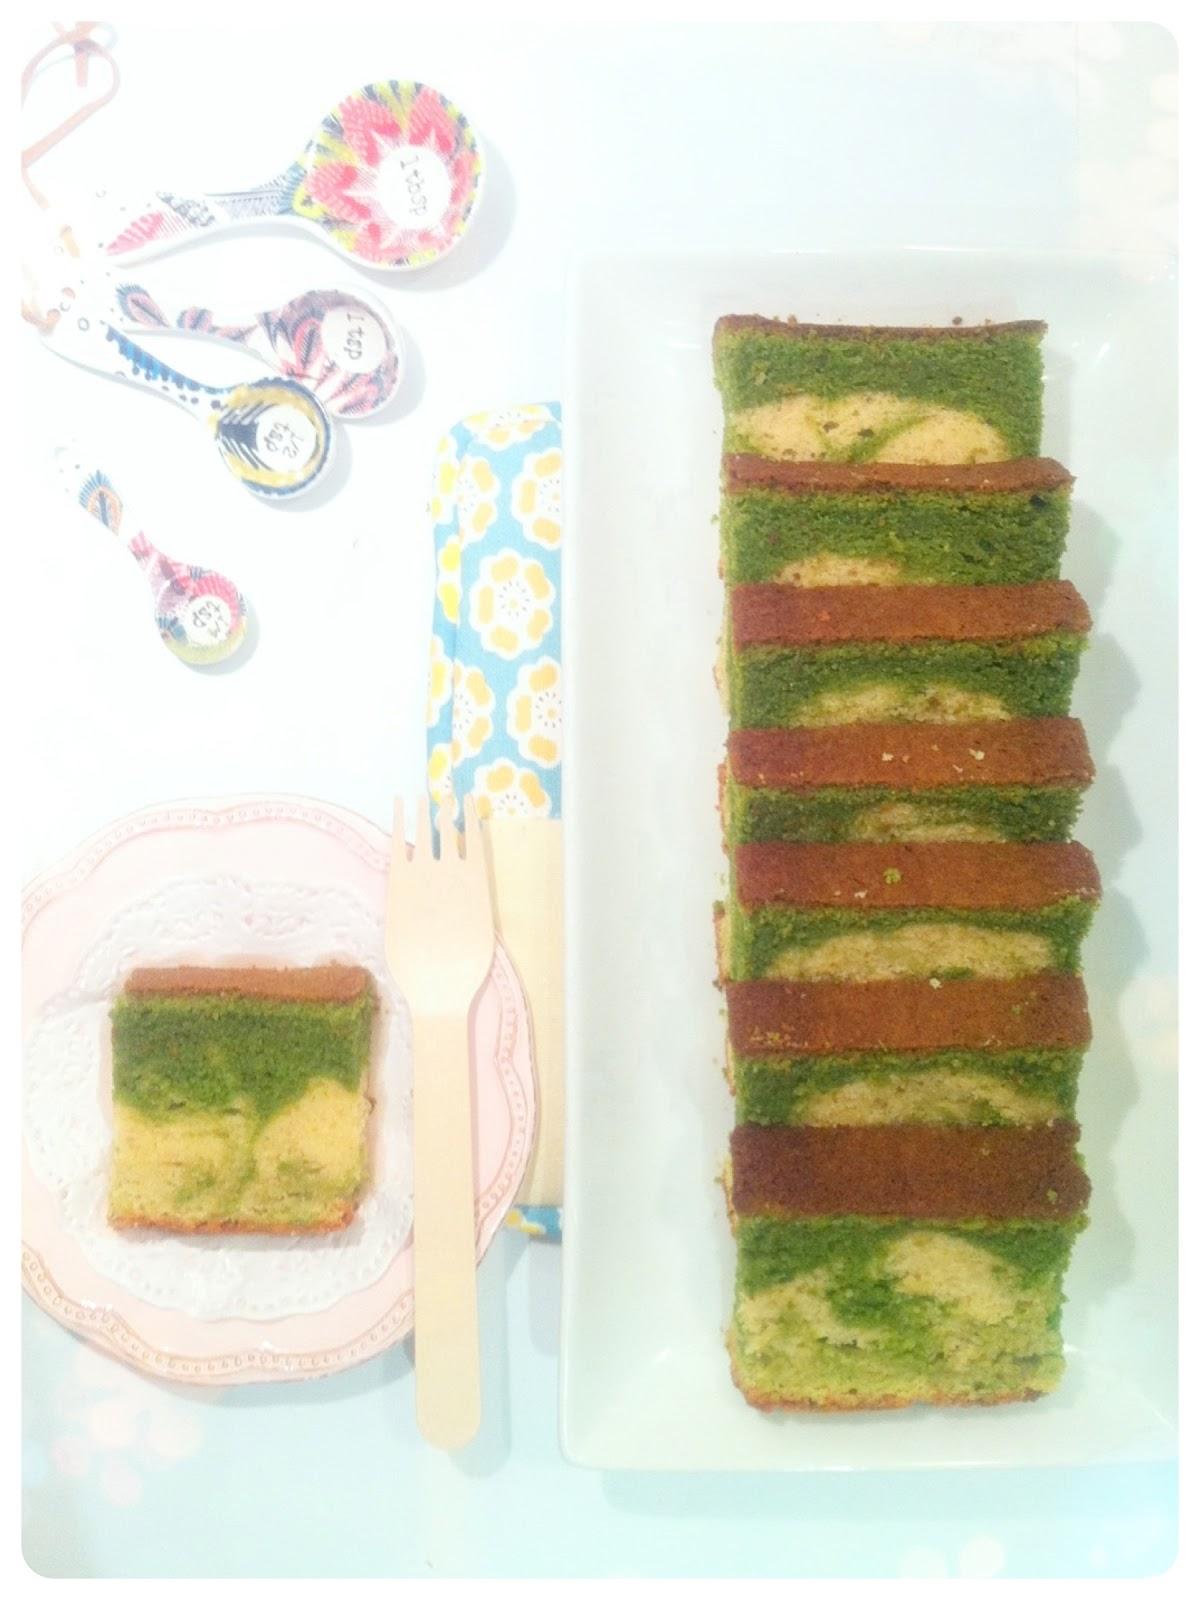 Matcha Green Tea Marble Cake Birthday Cake London Cherie Kelly